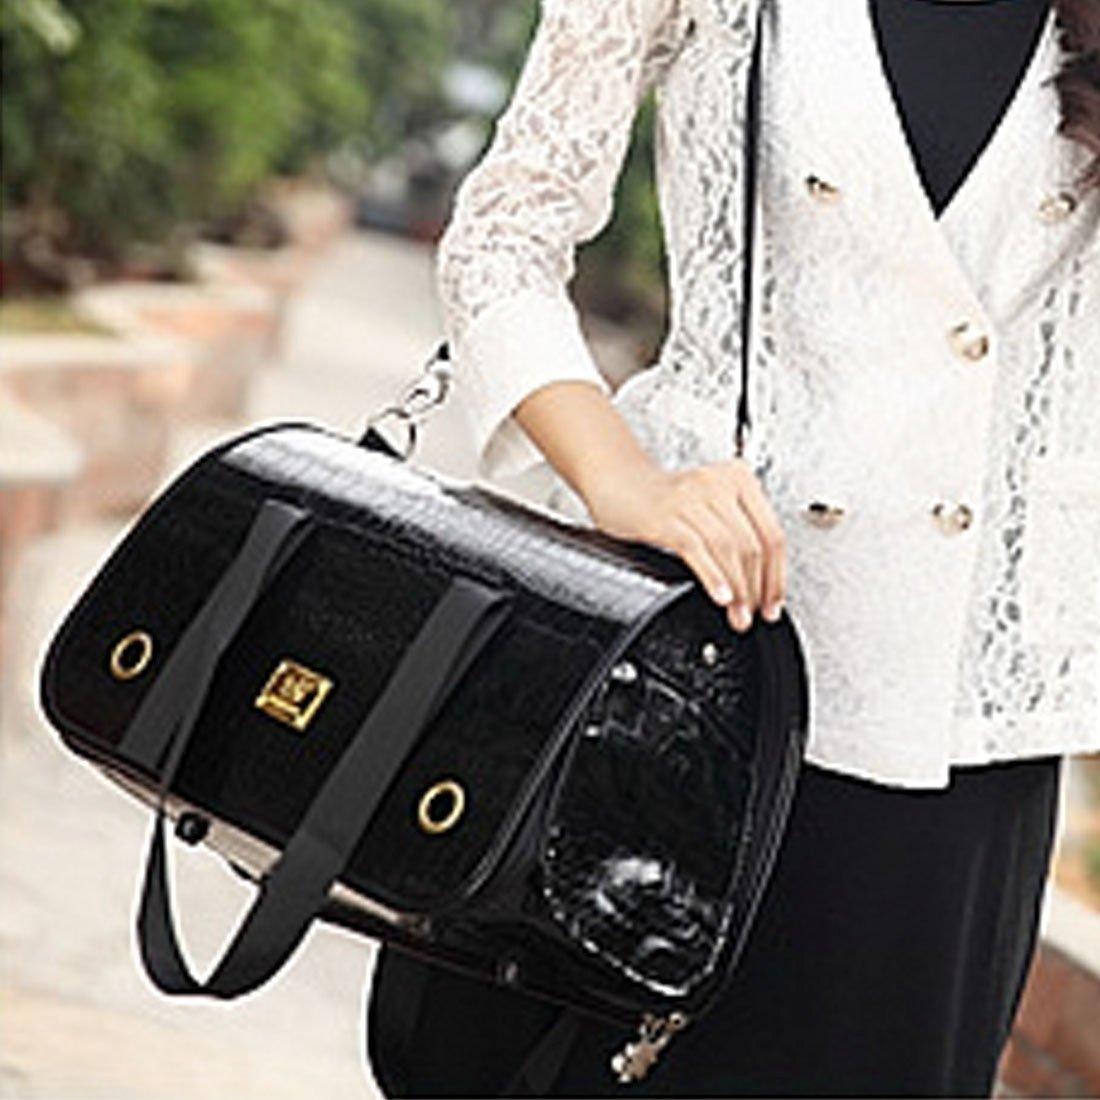 Hc6713a Pet Supplies Portable Folding Pet Handbag Shoulder Bag for Cat Dog and oher Pets Medium, Size 42  27  22cm (SKU   Hc6713a)